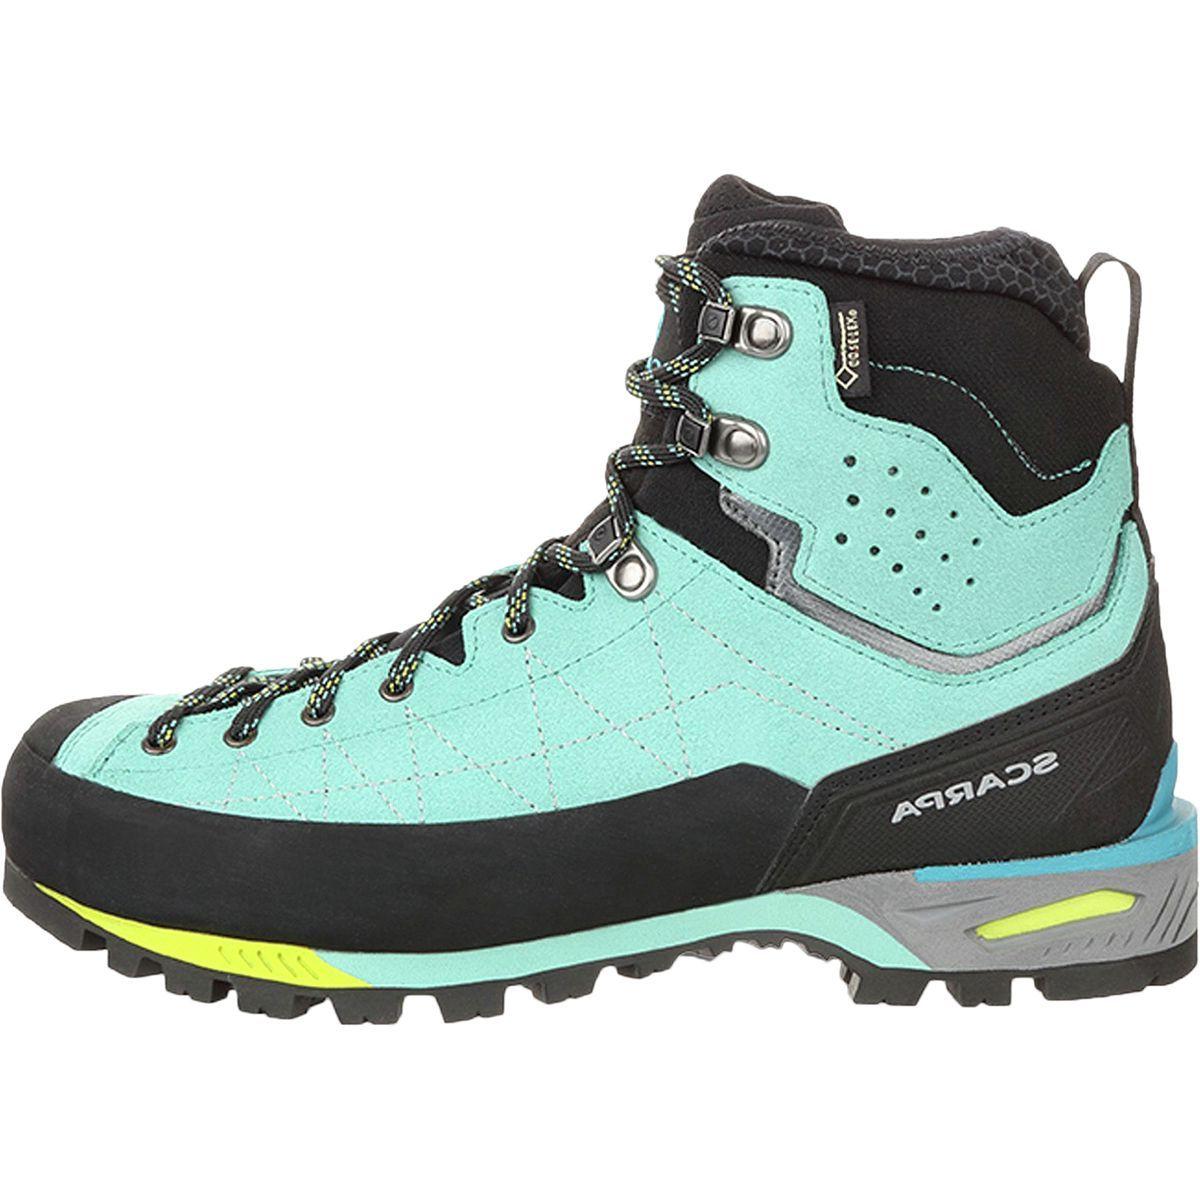 Scarpa Zodiac Tech GTX Mountaineering Boot - Women's